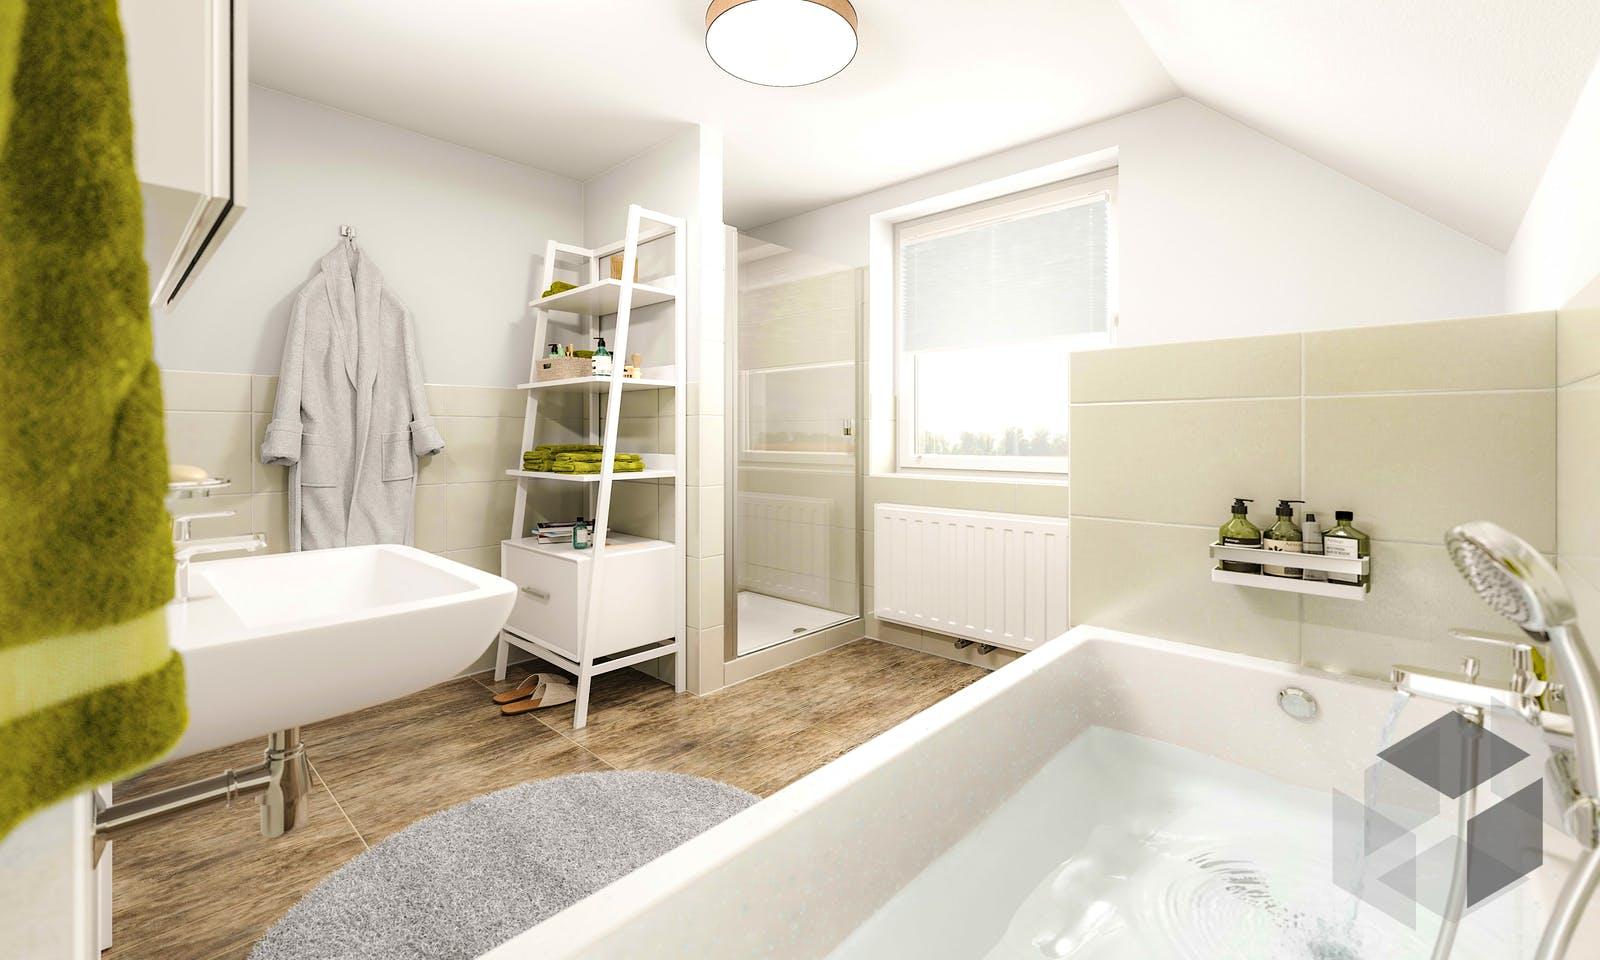 flair 125 von town country haus. Black Bedroom Furniture Sets. Home Design Ideas